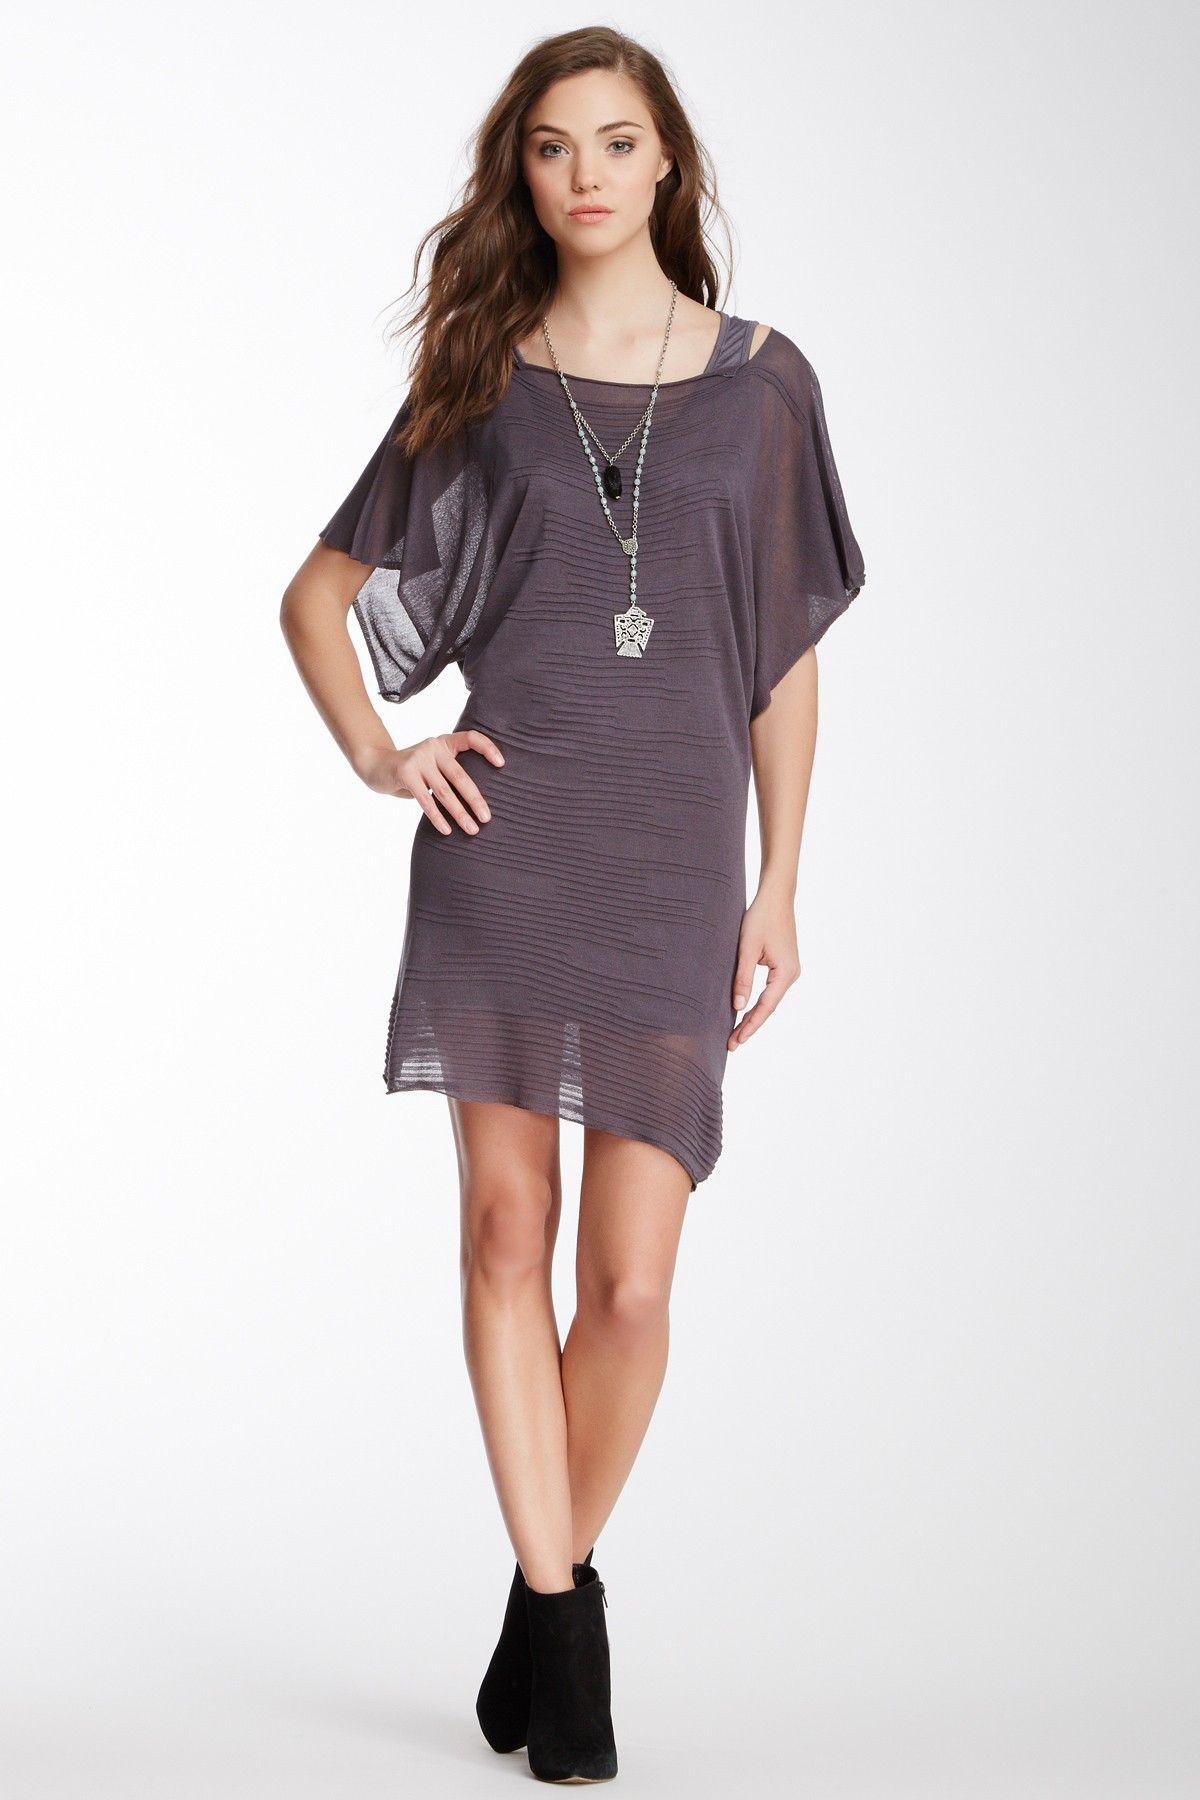 Tunic Inset Sheer Sweater Dress